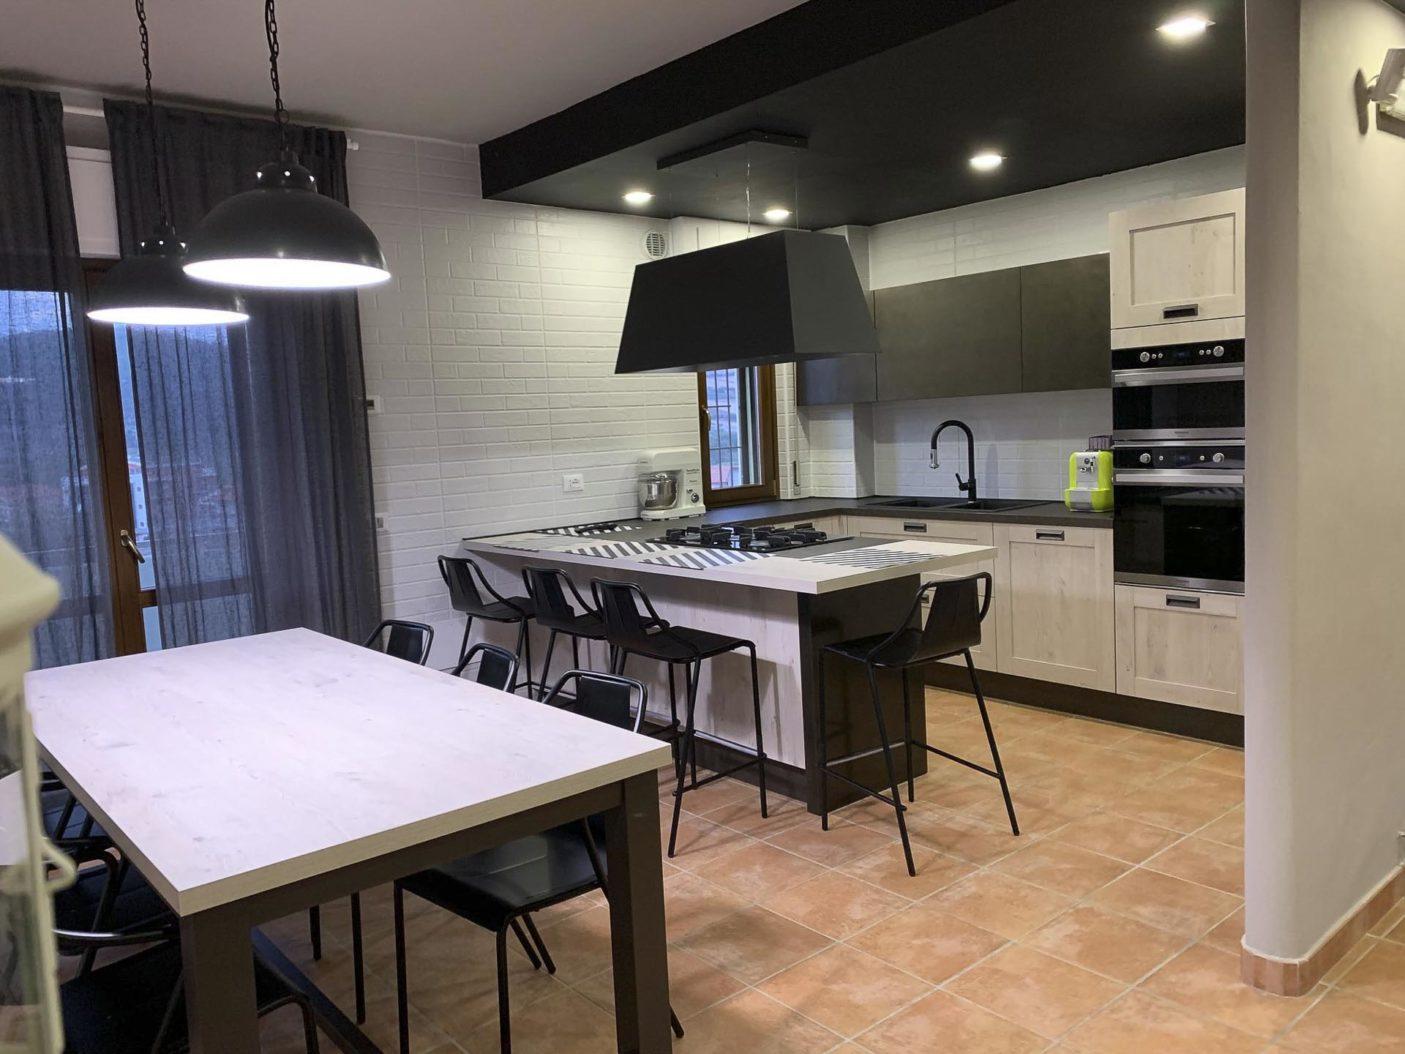 Cucina-Creo-Kitchens-Kyra-a-Telaio4.jpg